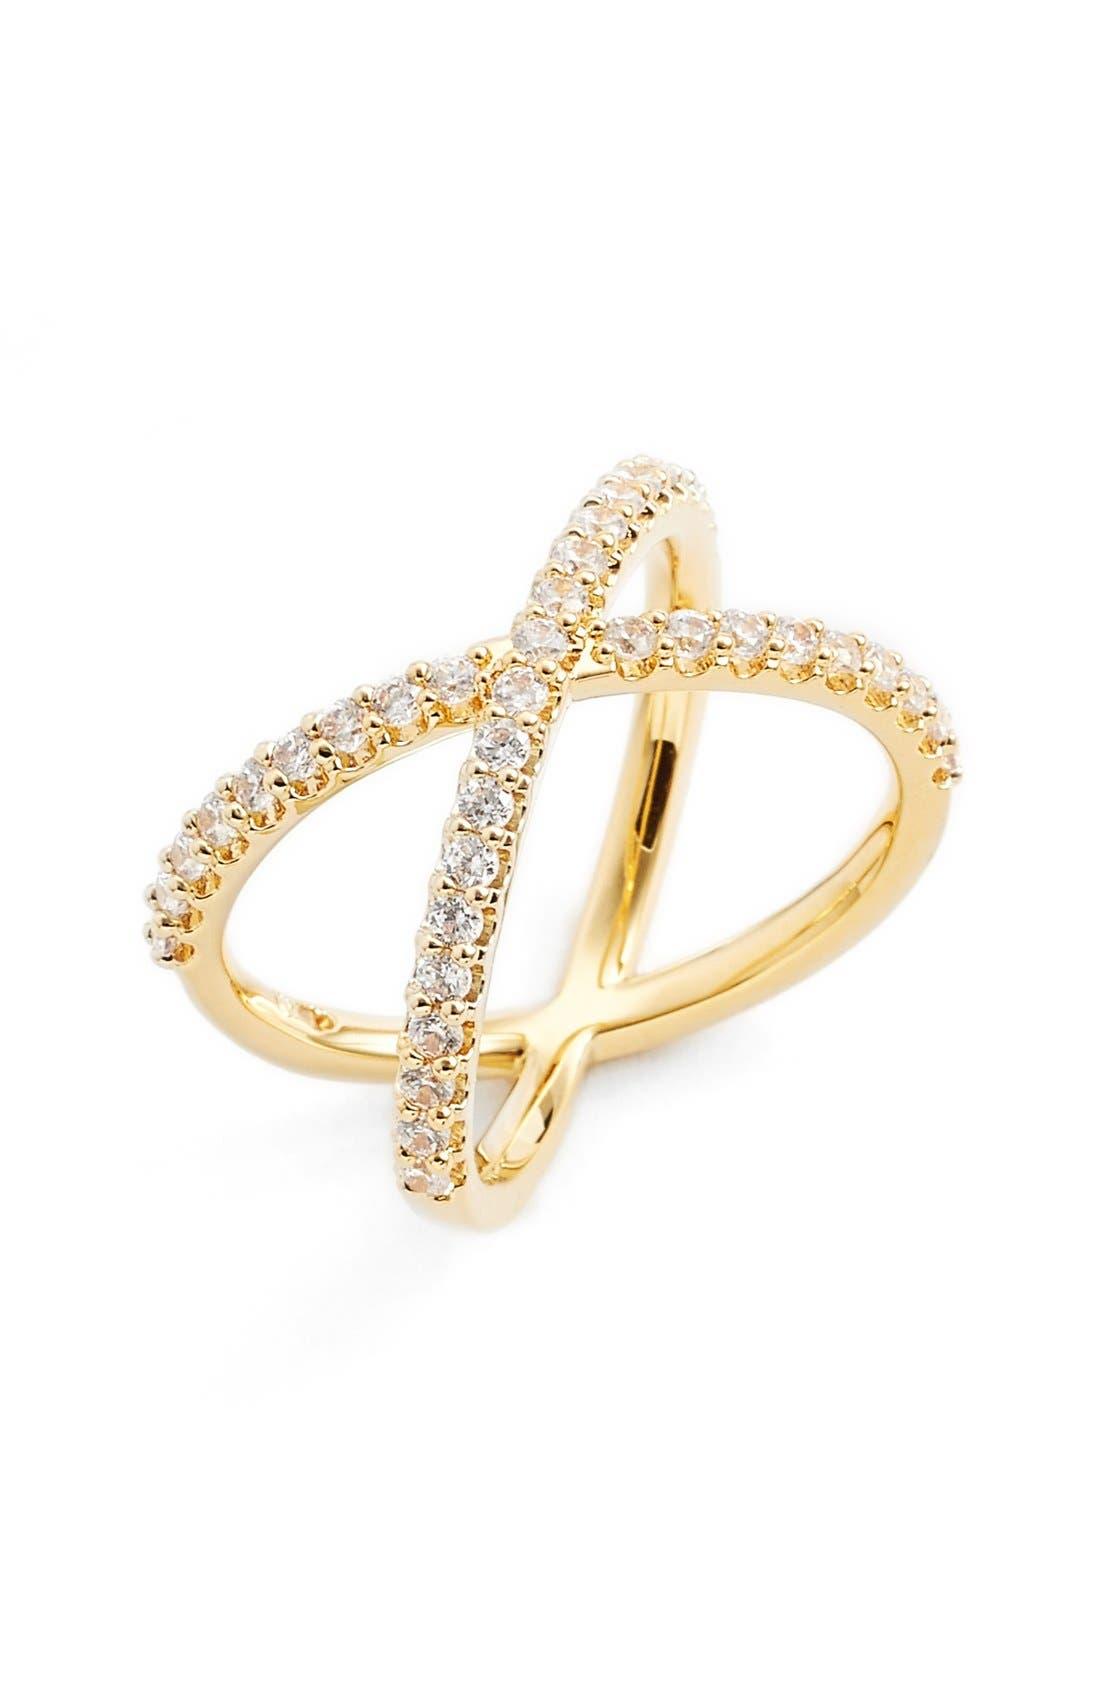 Canary Diamond Weding Rings 012 - Canary Diamond Weding Rings